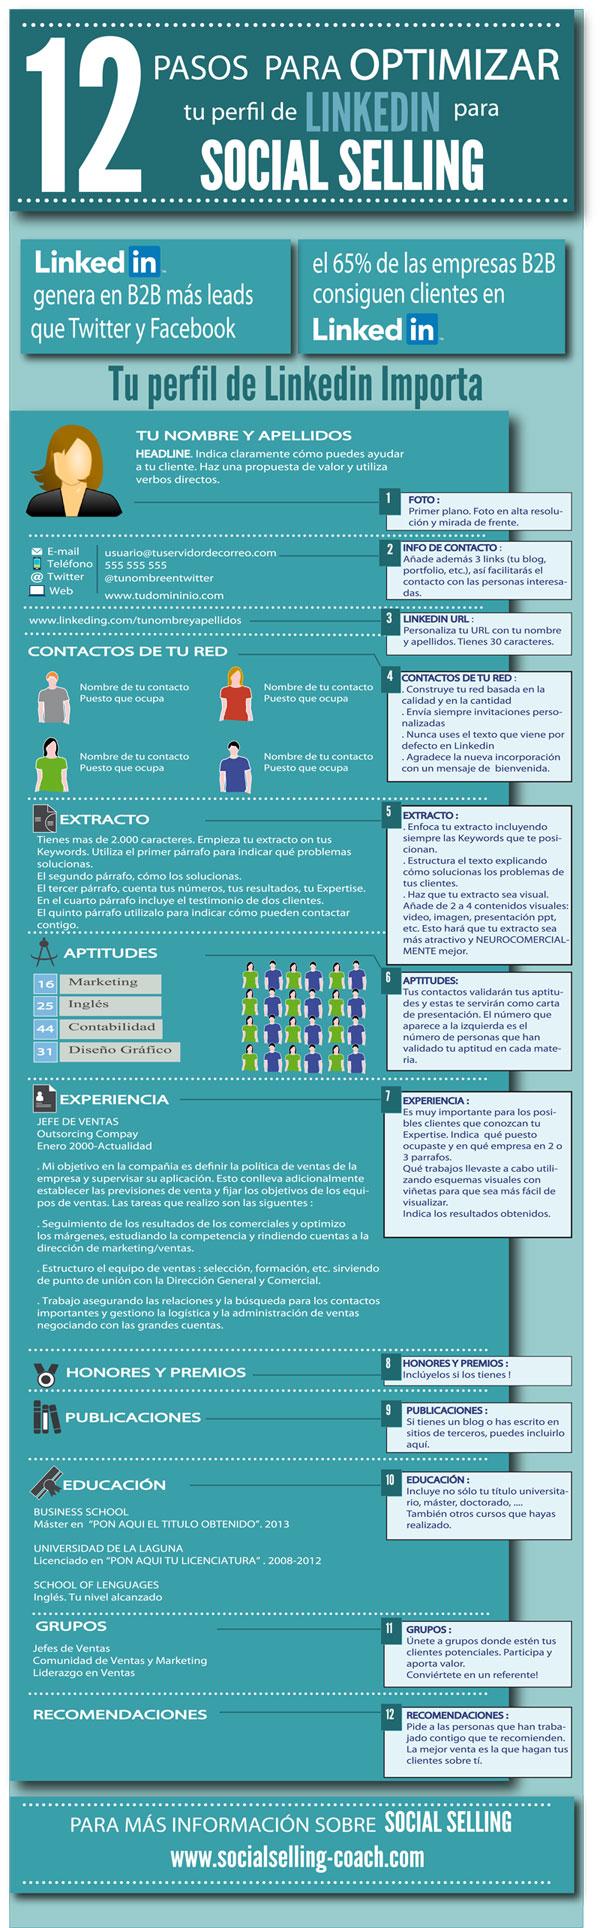 12 pasos para un perfil de LinkedIn perfecto para Social Selling